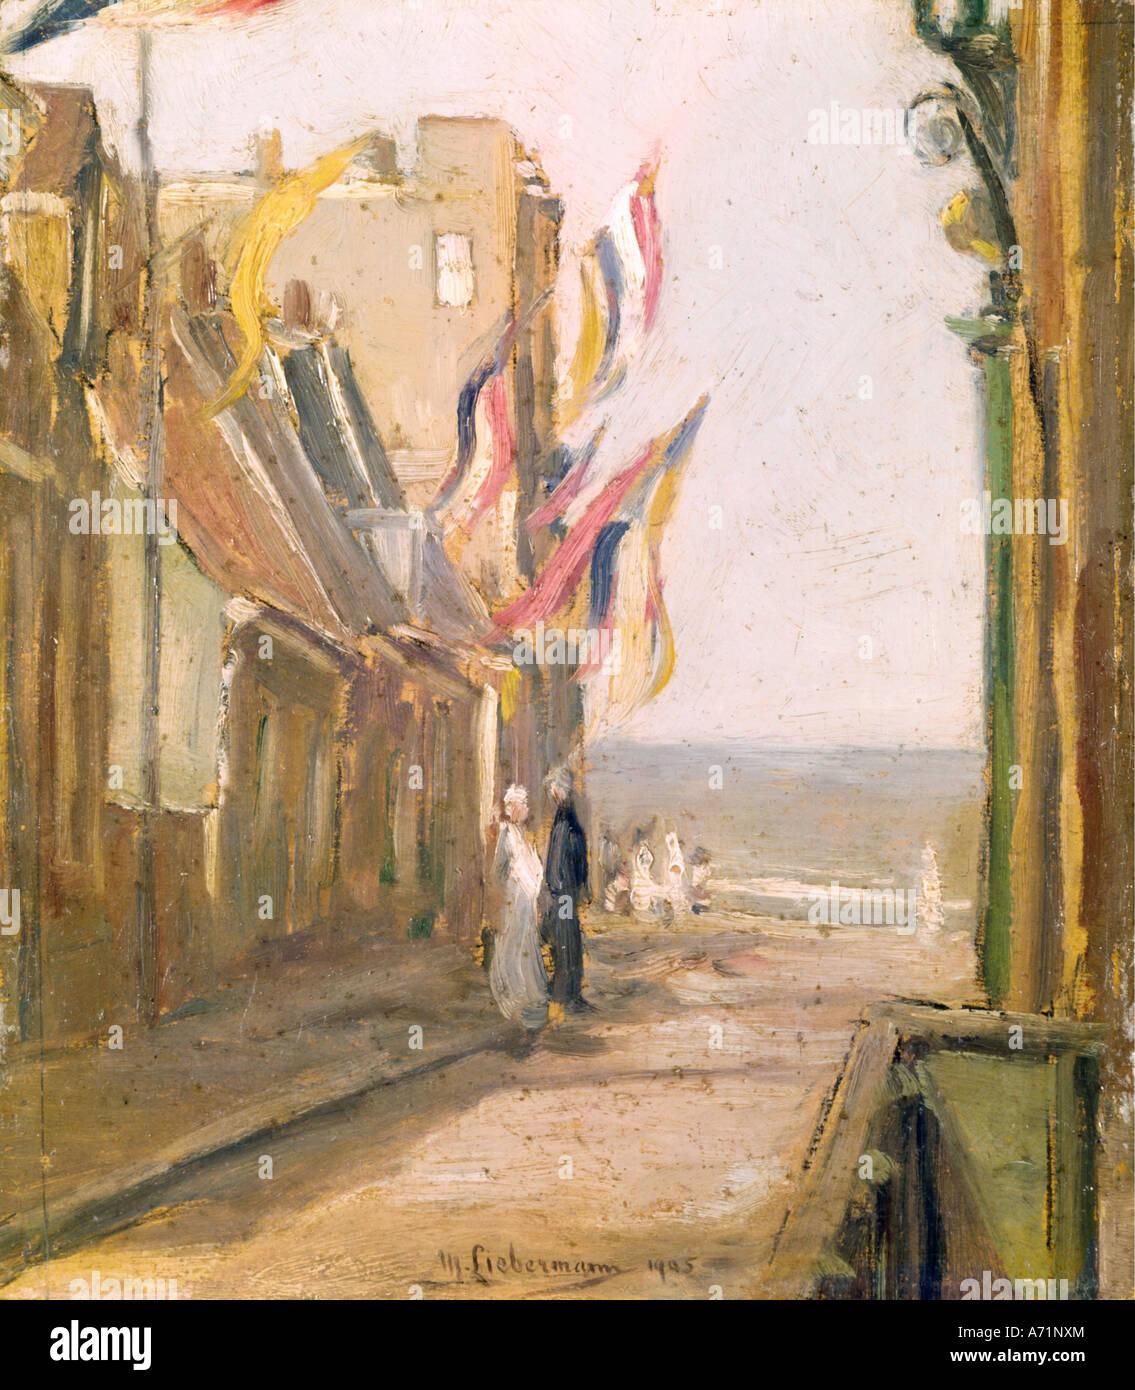 "'Fine Arts, Liebermann, Max, (1847 - 1935), peinture, 'Poggio all', ('holiday""), propriété Photo Stock"